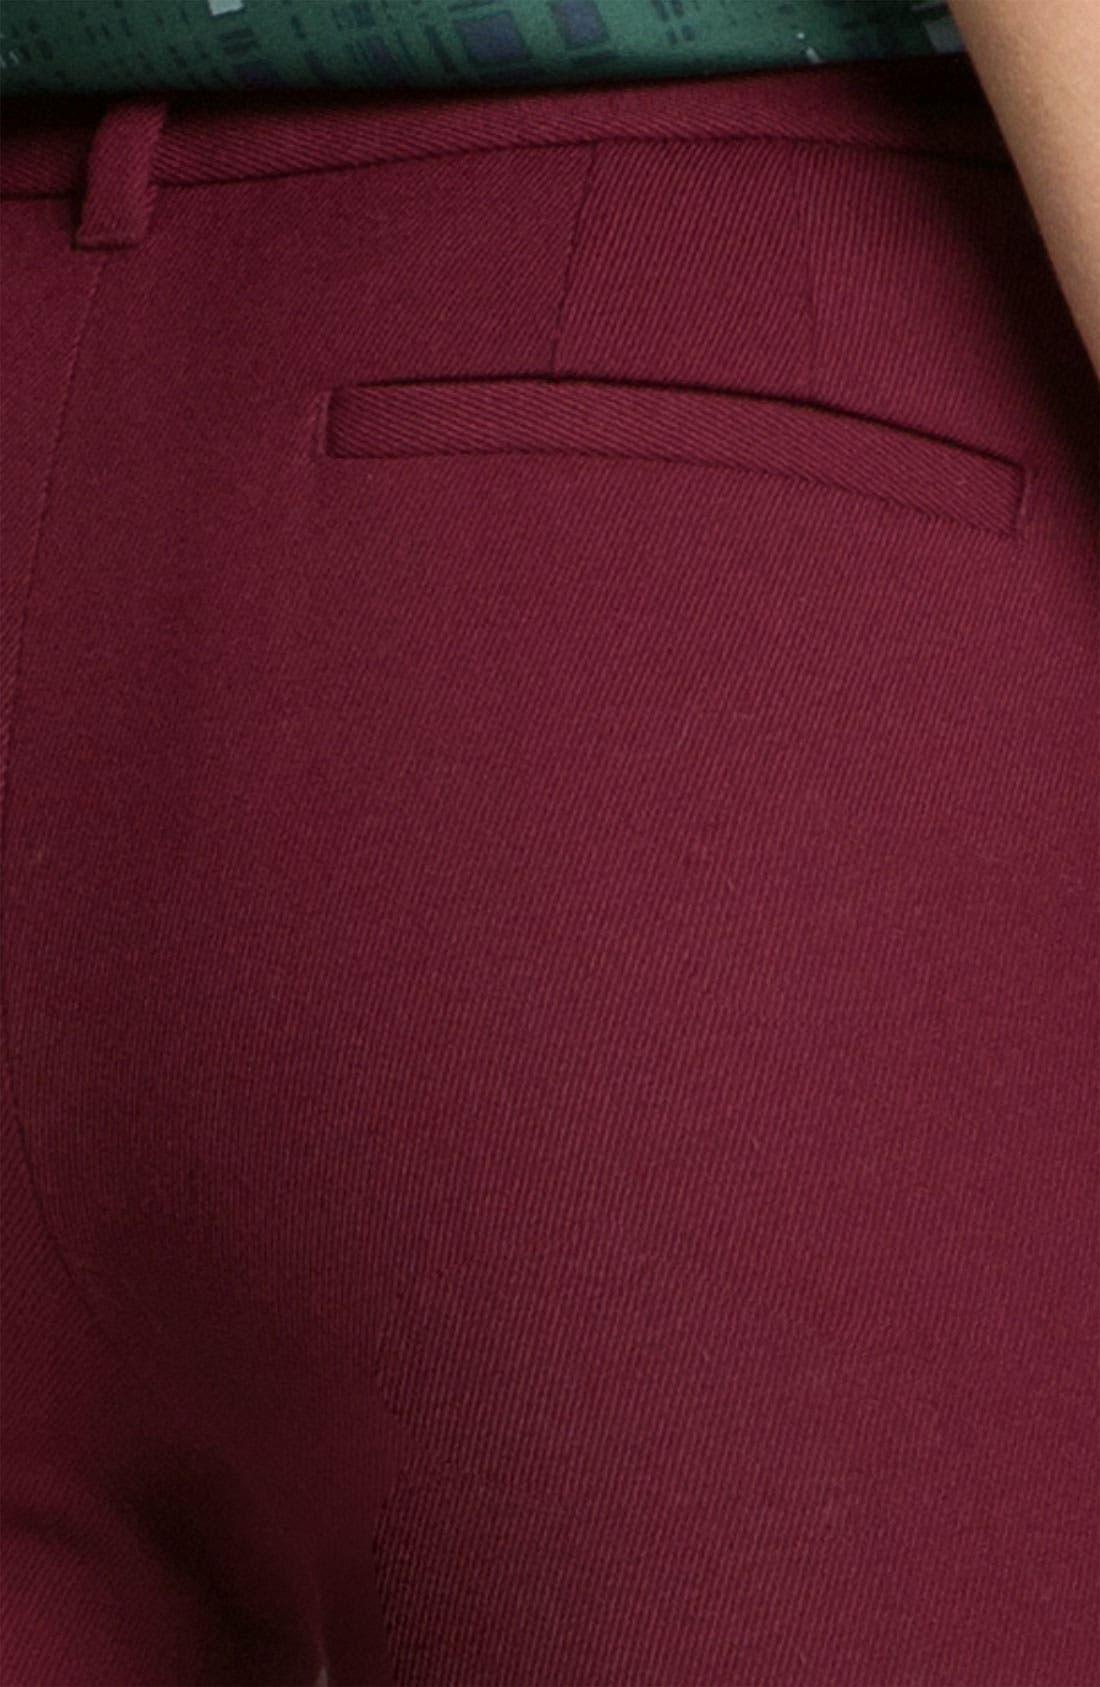 Alternate Image 3  - Tory Burch 'Celeste' Pants